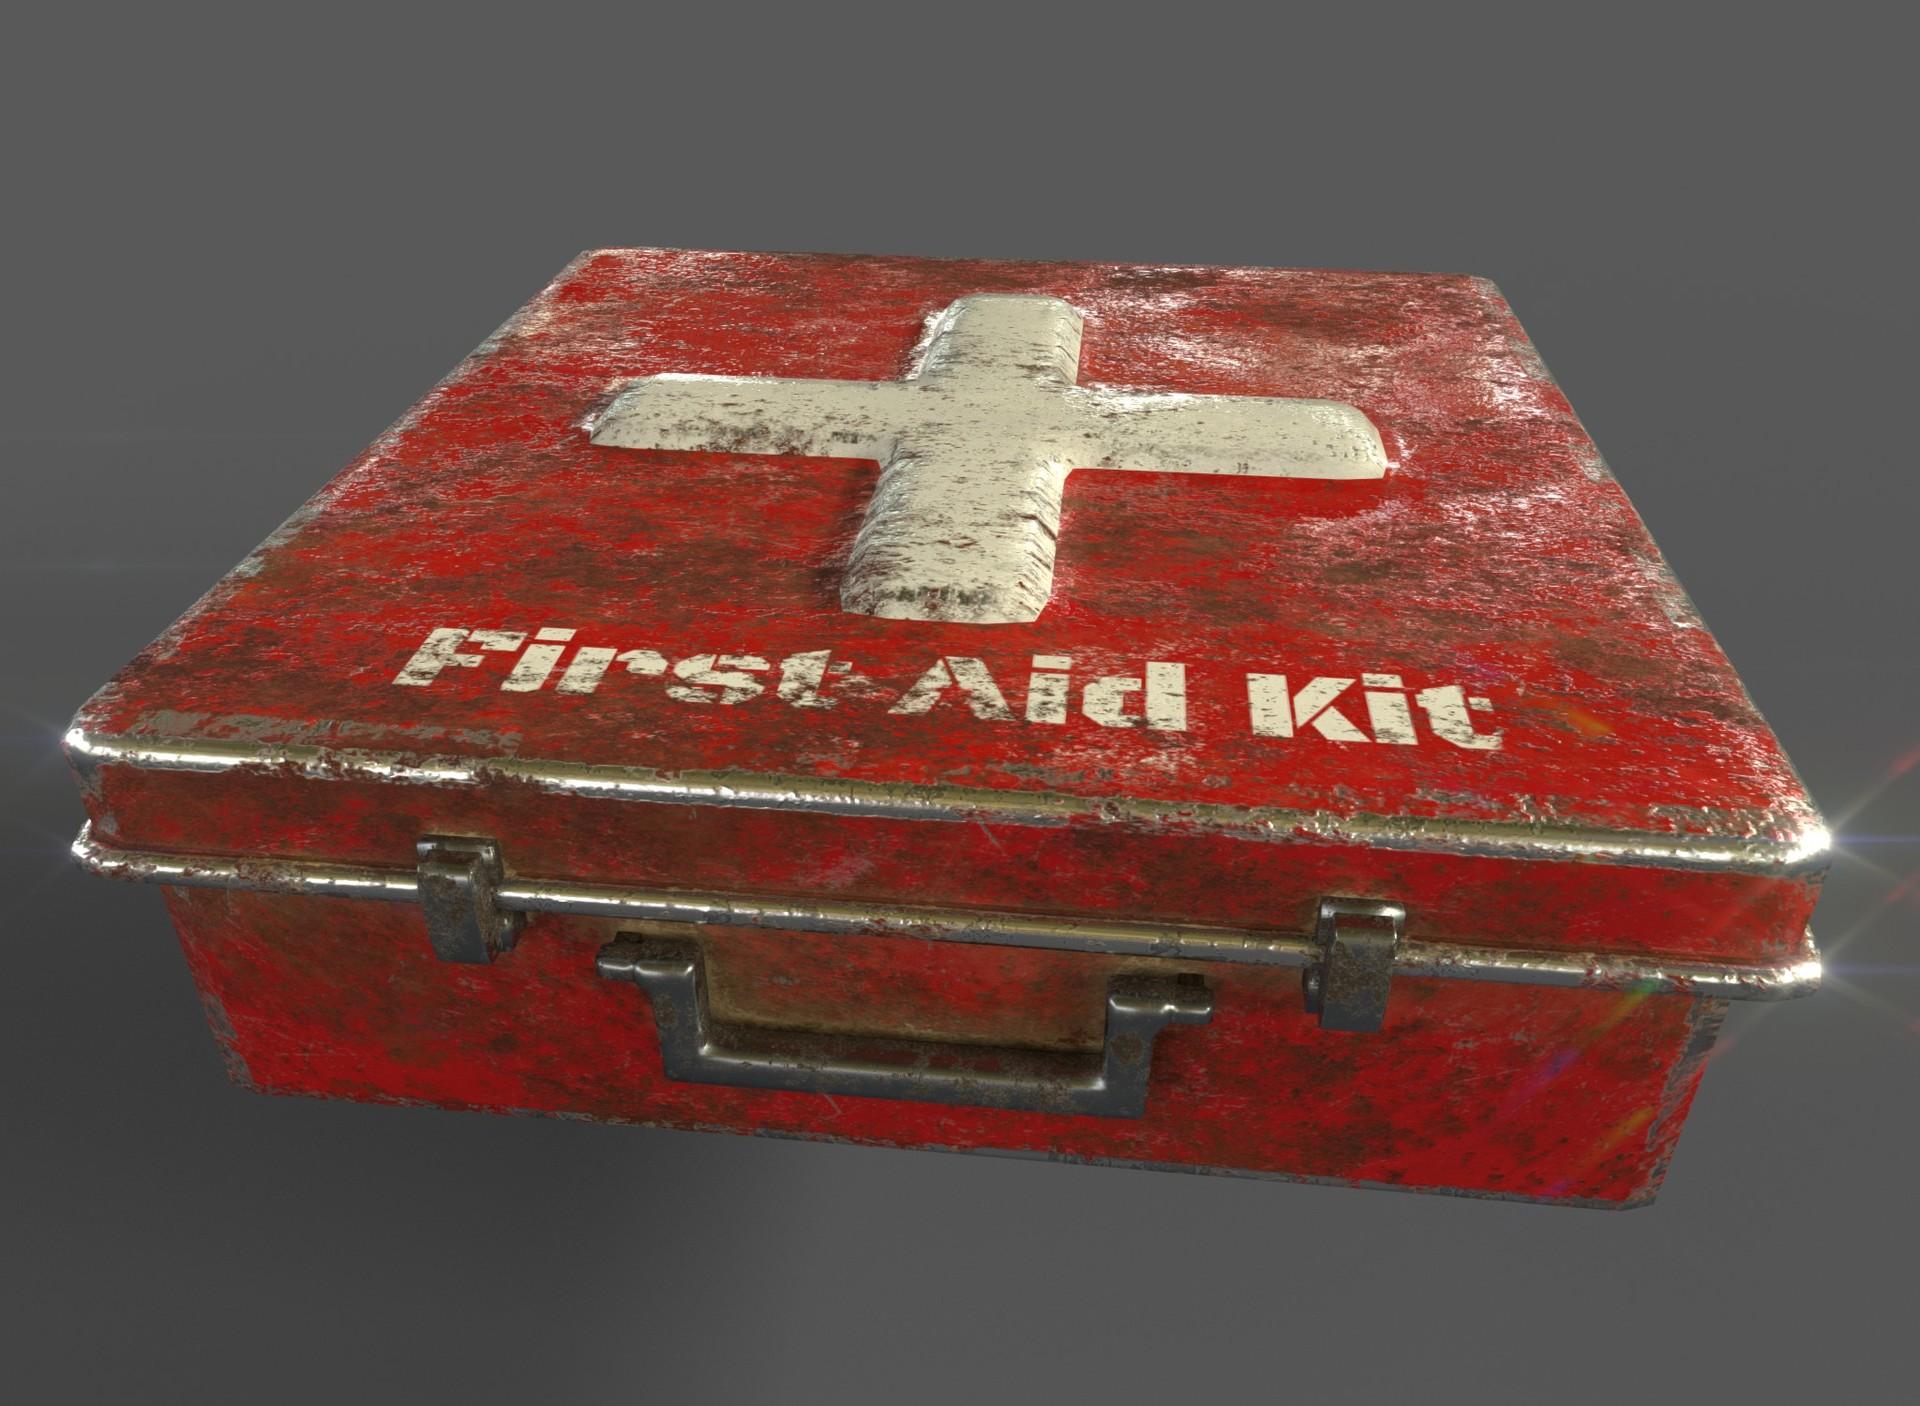 kayla cobb old first aid kit